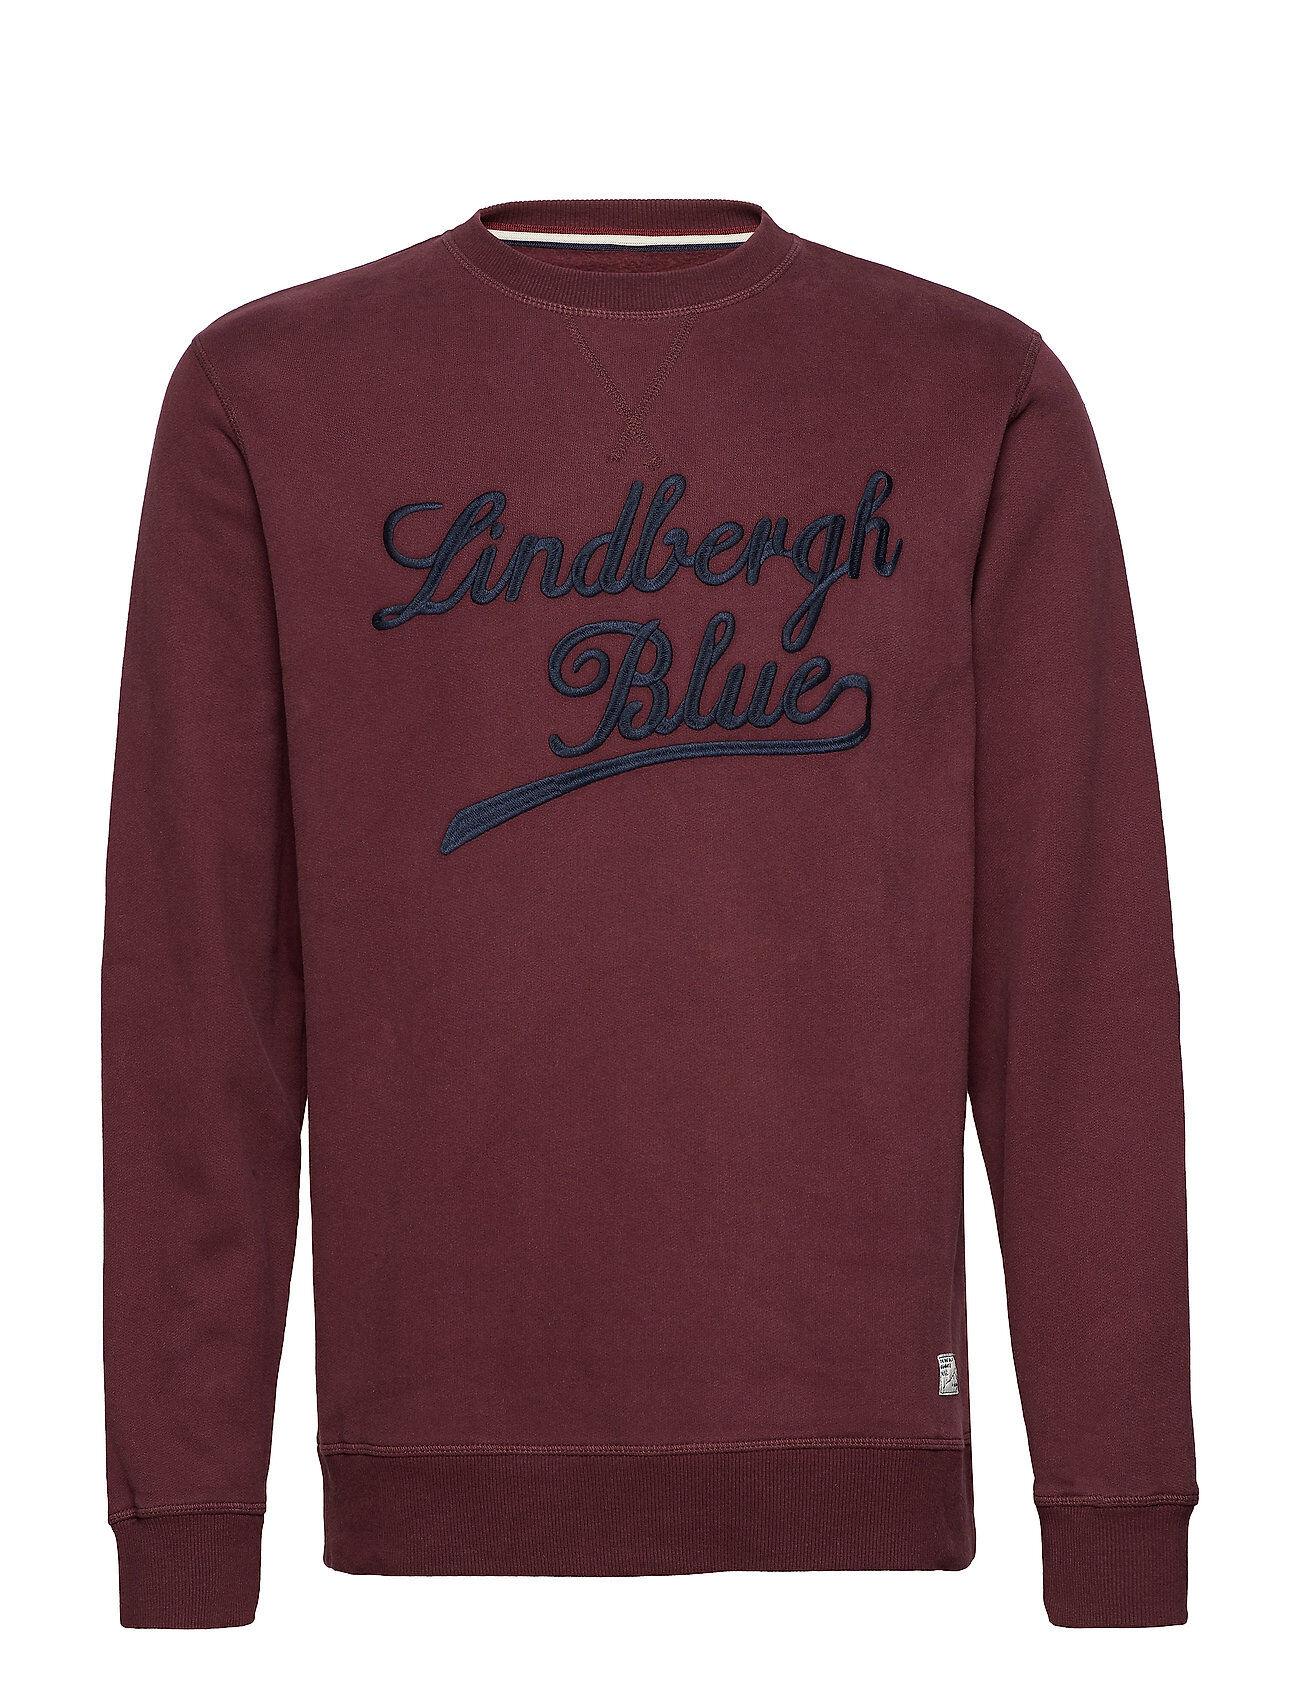 Lindbergh Applique Sweatshirt